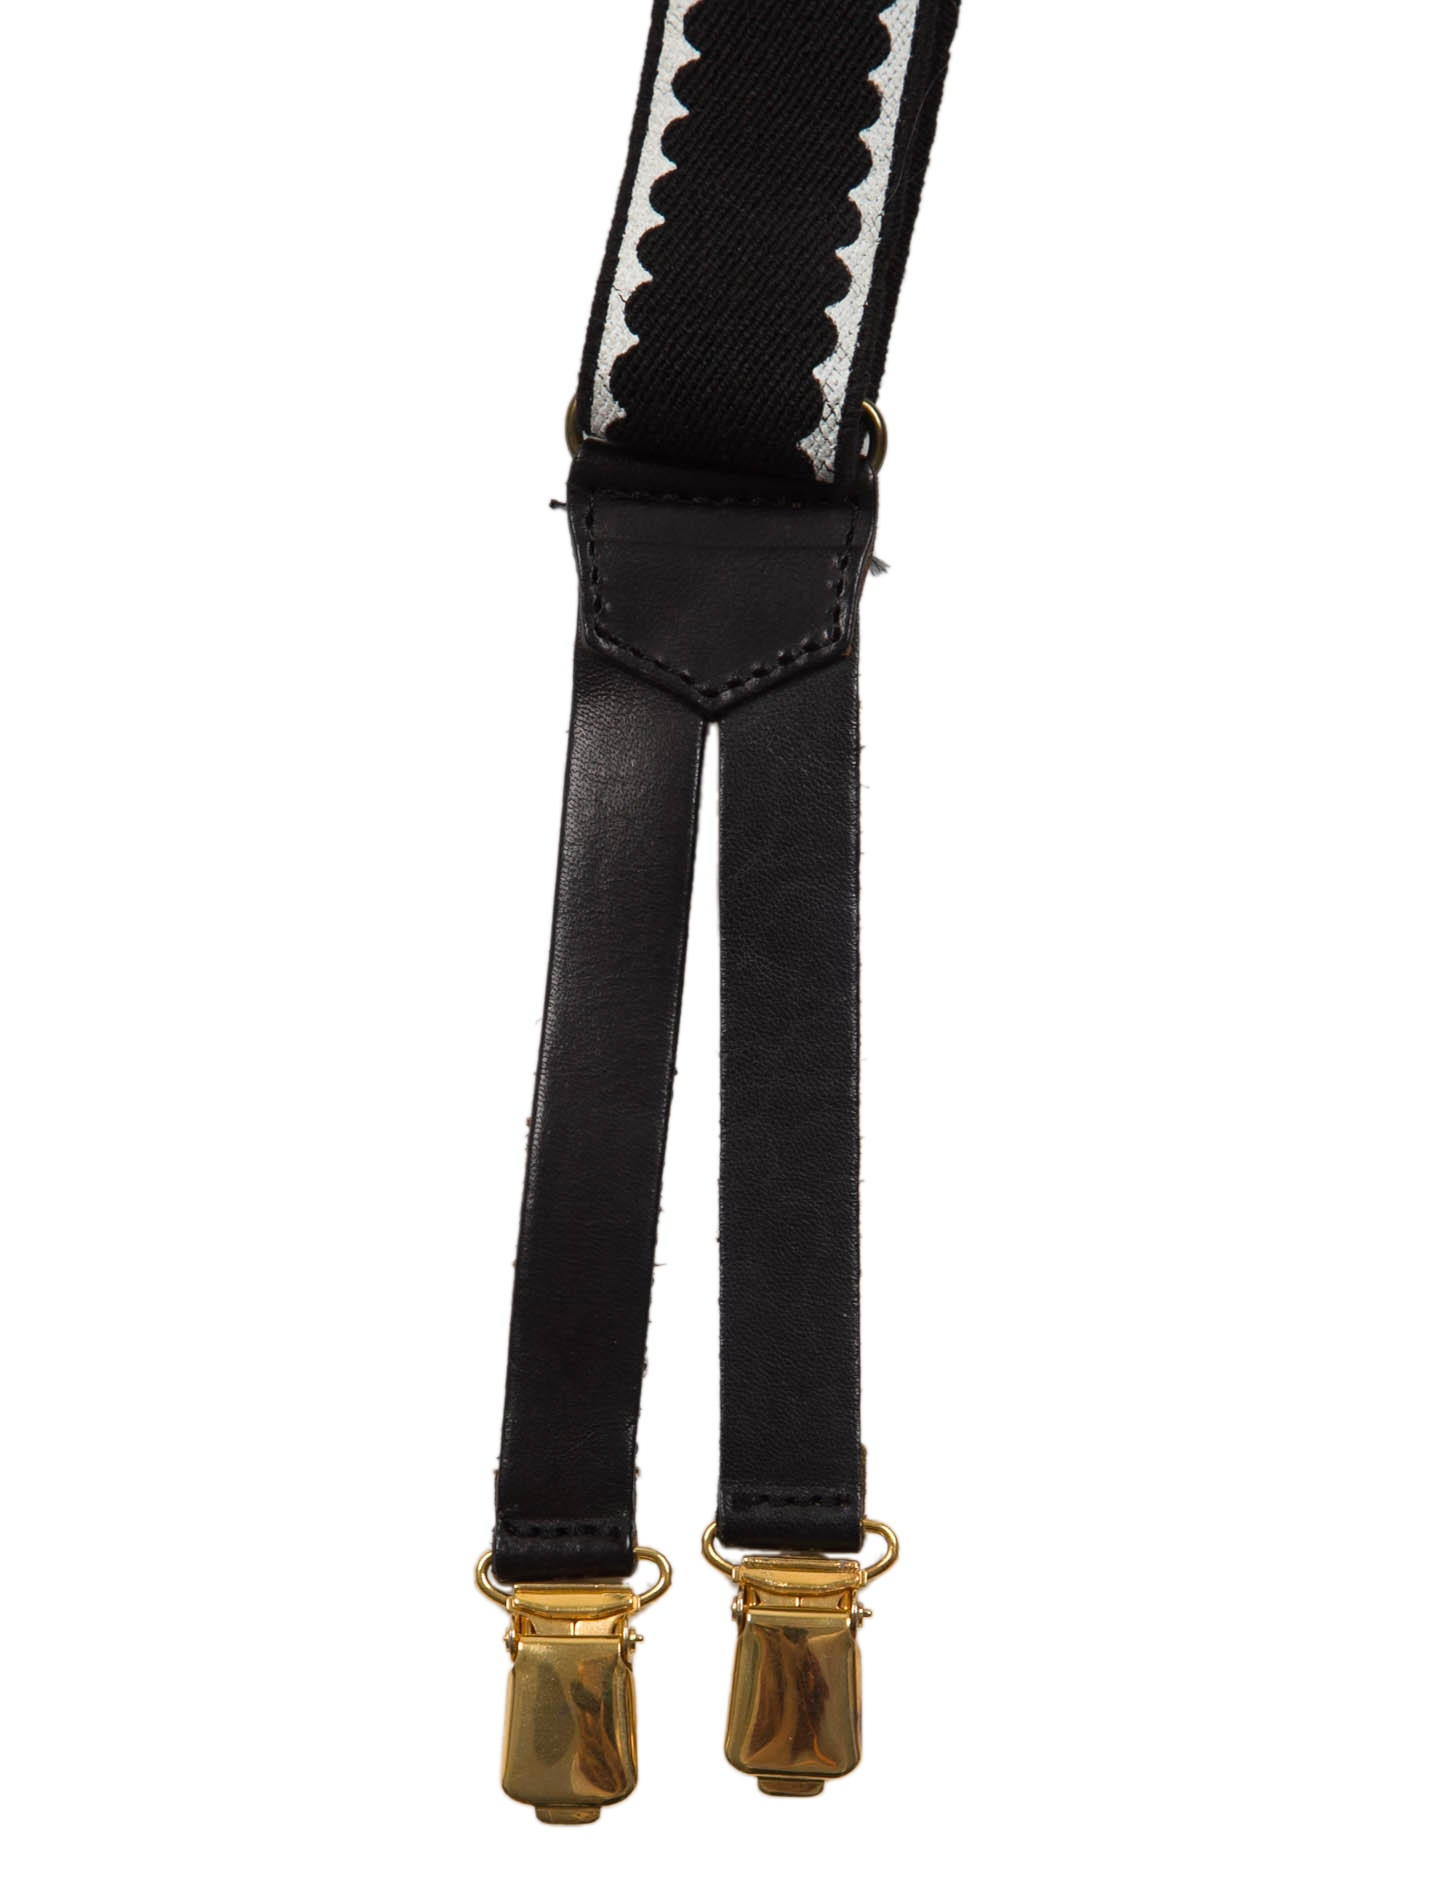 chanel suspenders. suspenders chanel